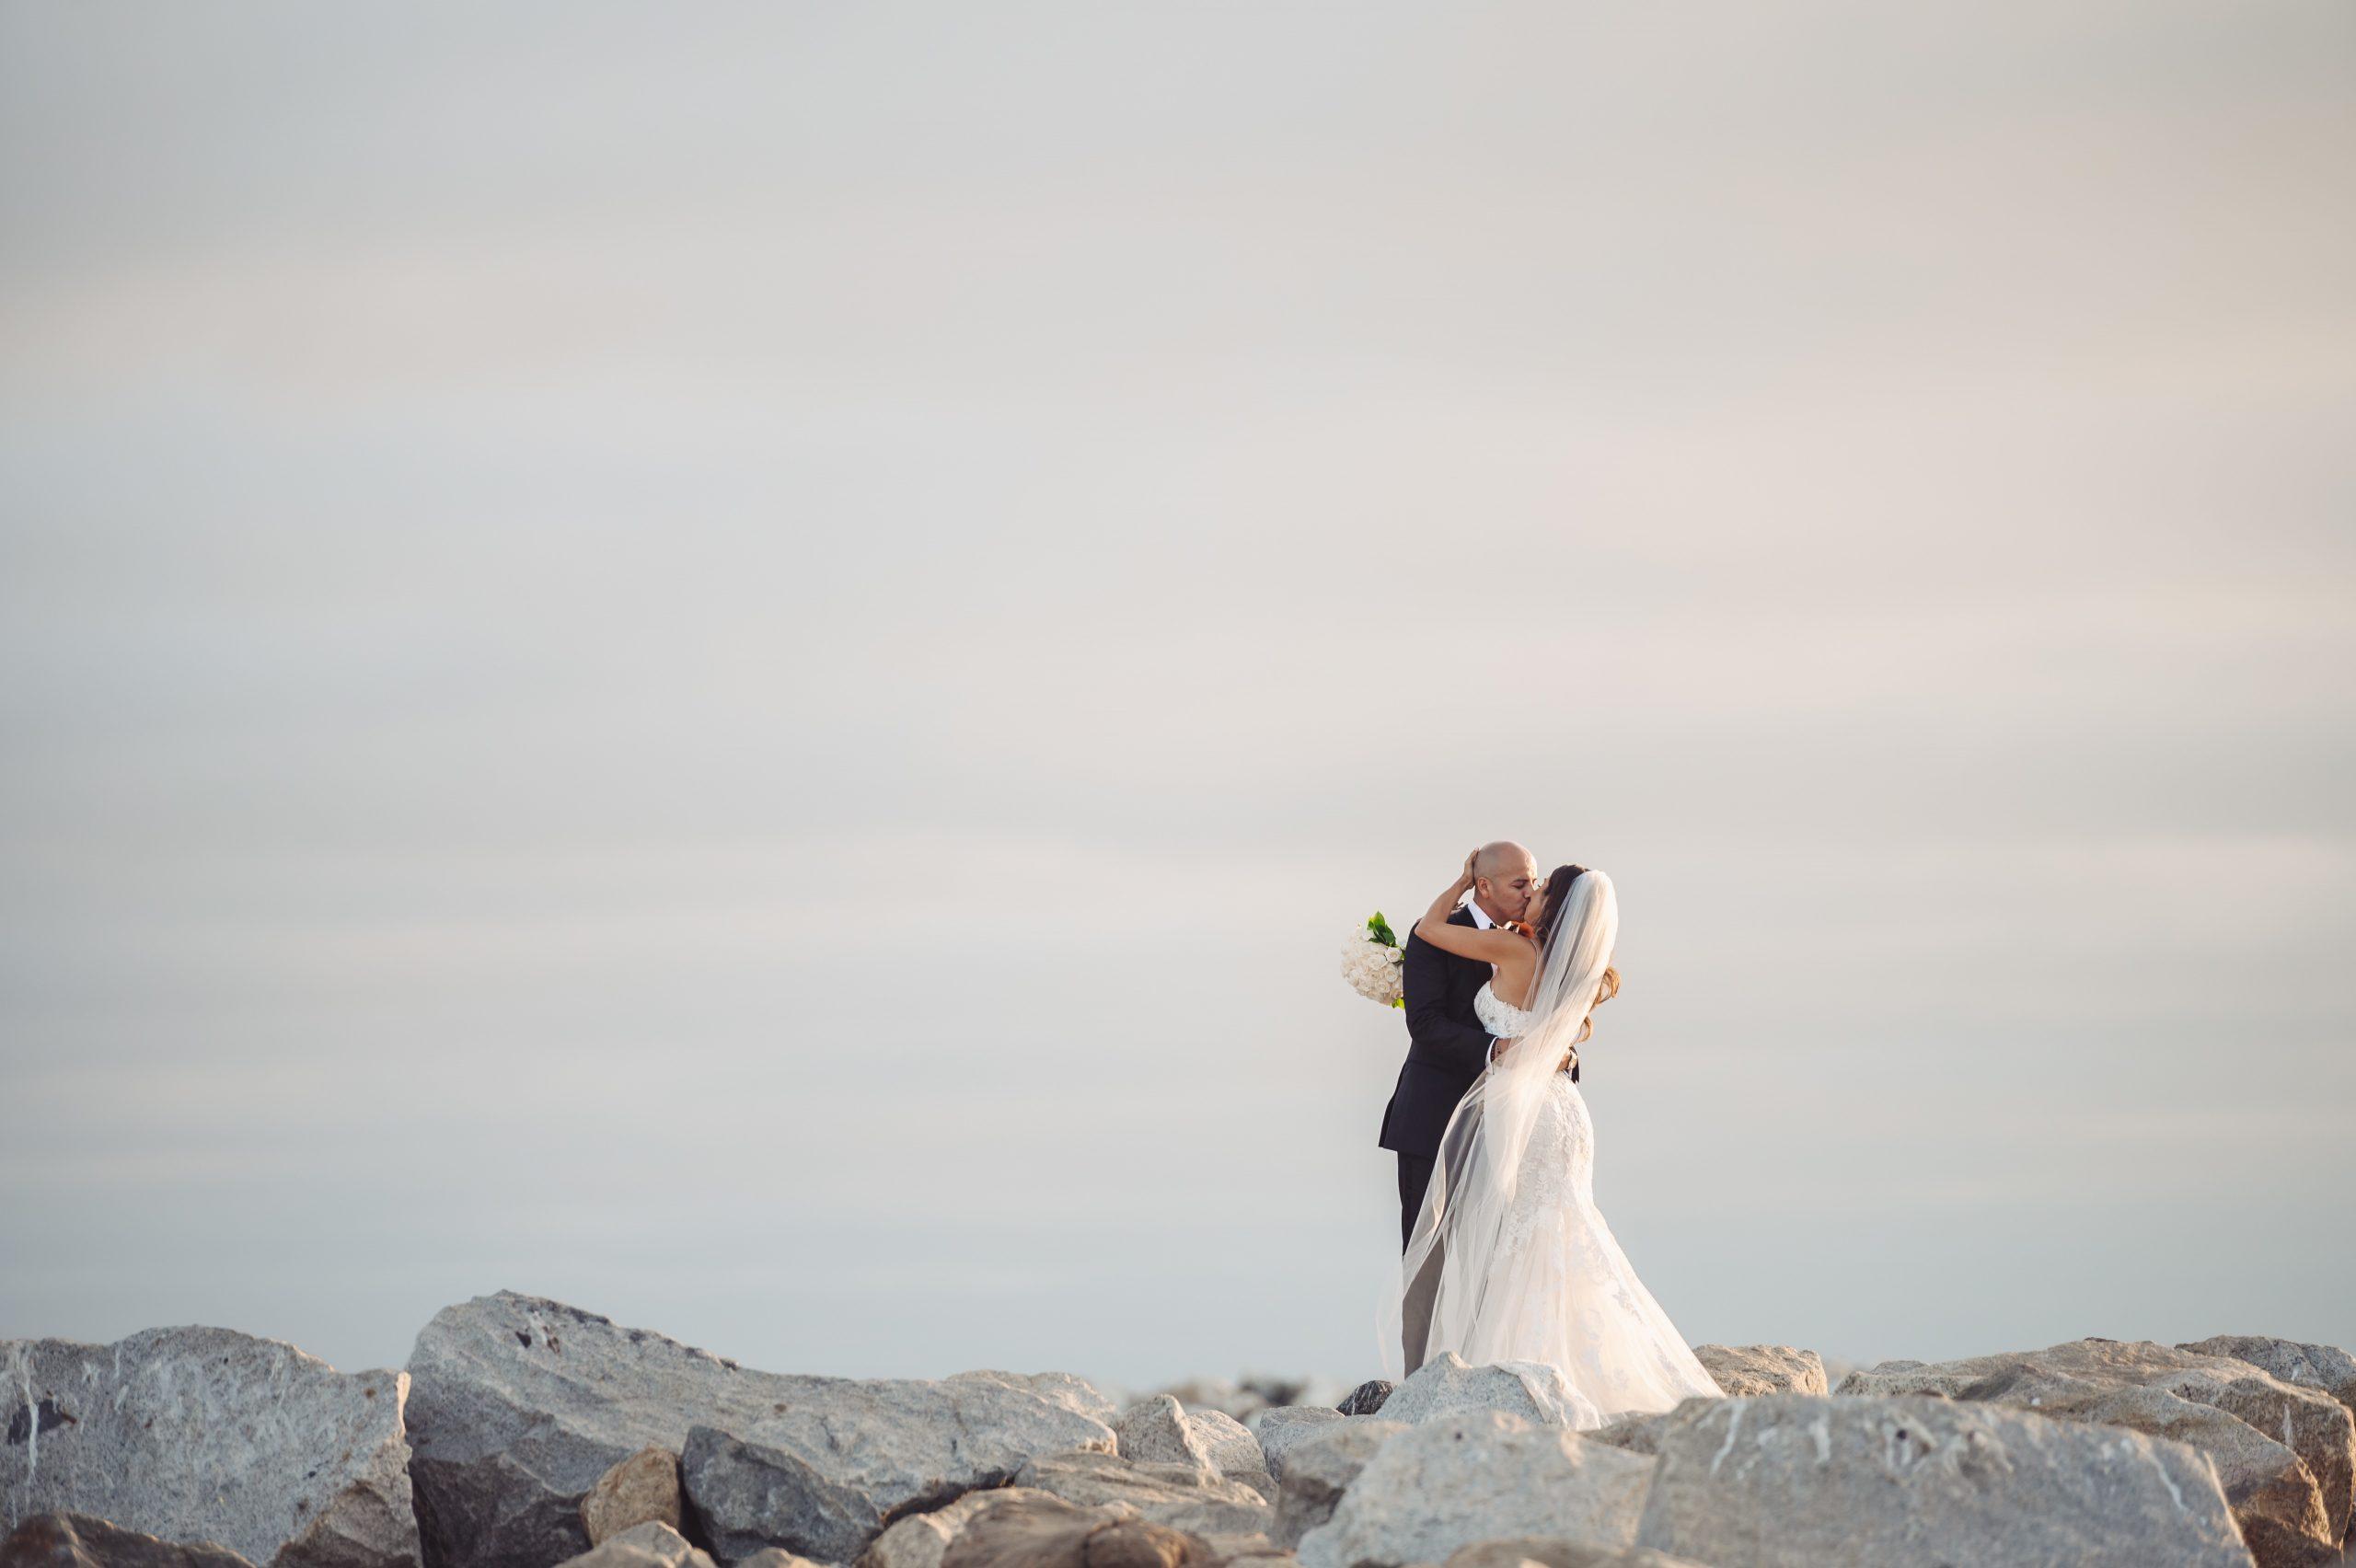 The Portofino Hotel & Marina Wedding Venue | Wedding Video Christina & Ramon | LifeStory.Film